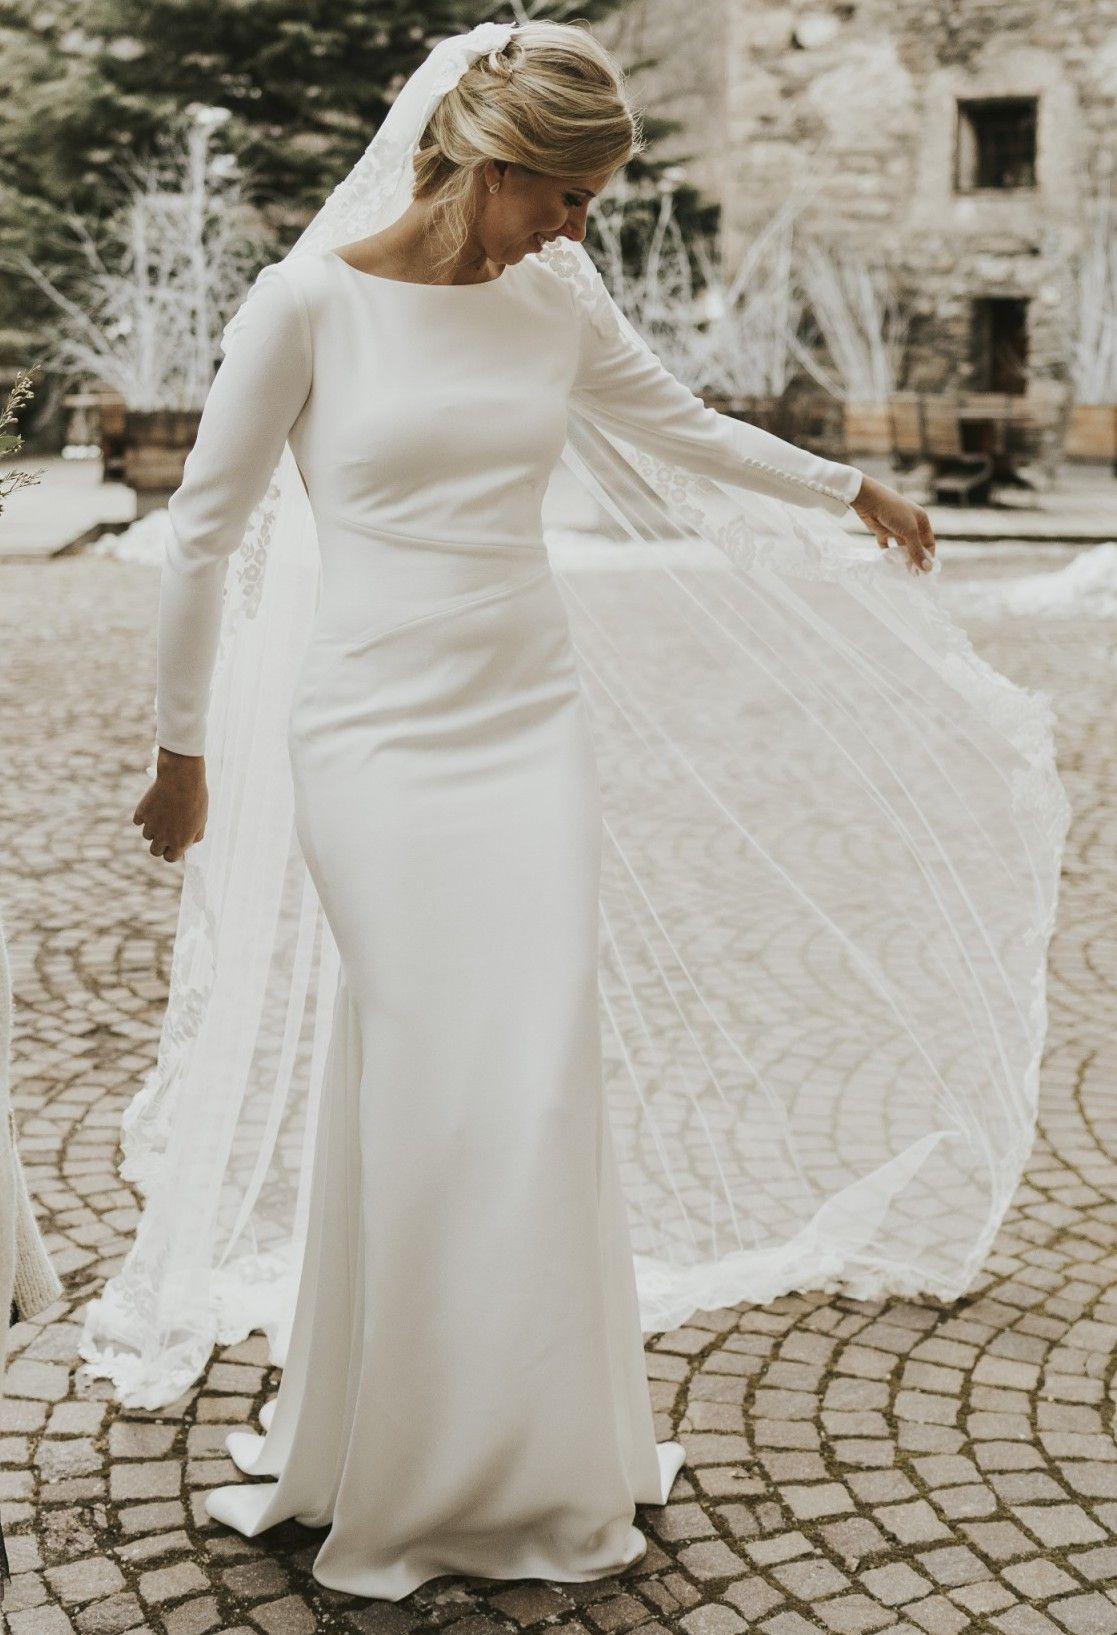 Pronovias Valeria Used Wedding Dress Save 77 Dresses Wedding Dresses Conservative Wedding Dress [ 1635 x 1117 Pixel ]